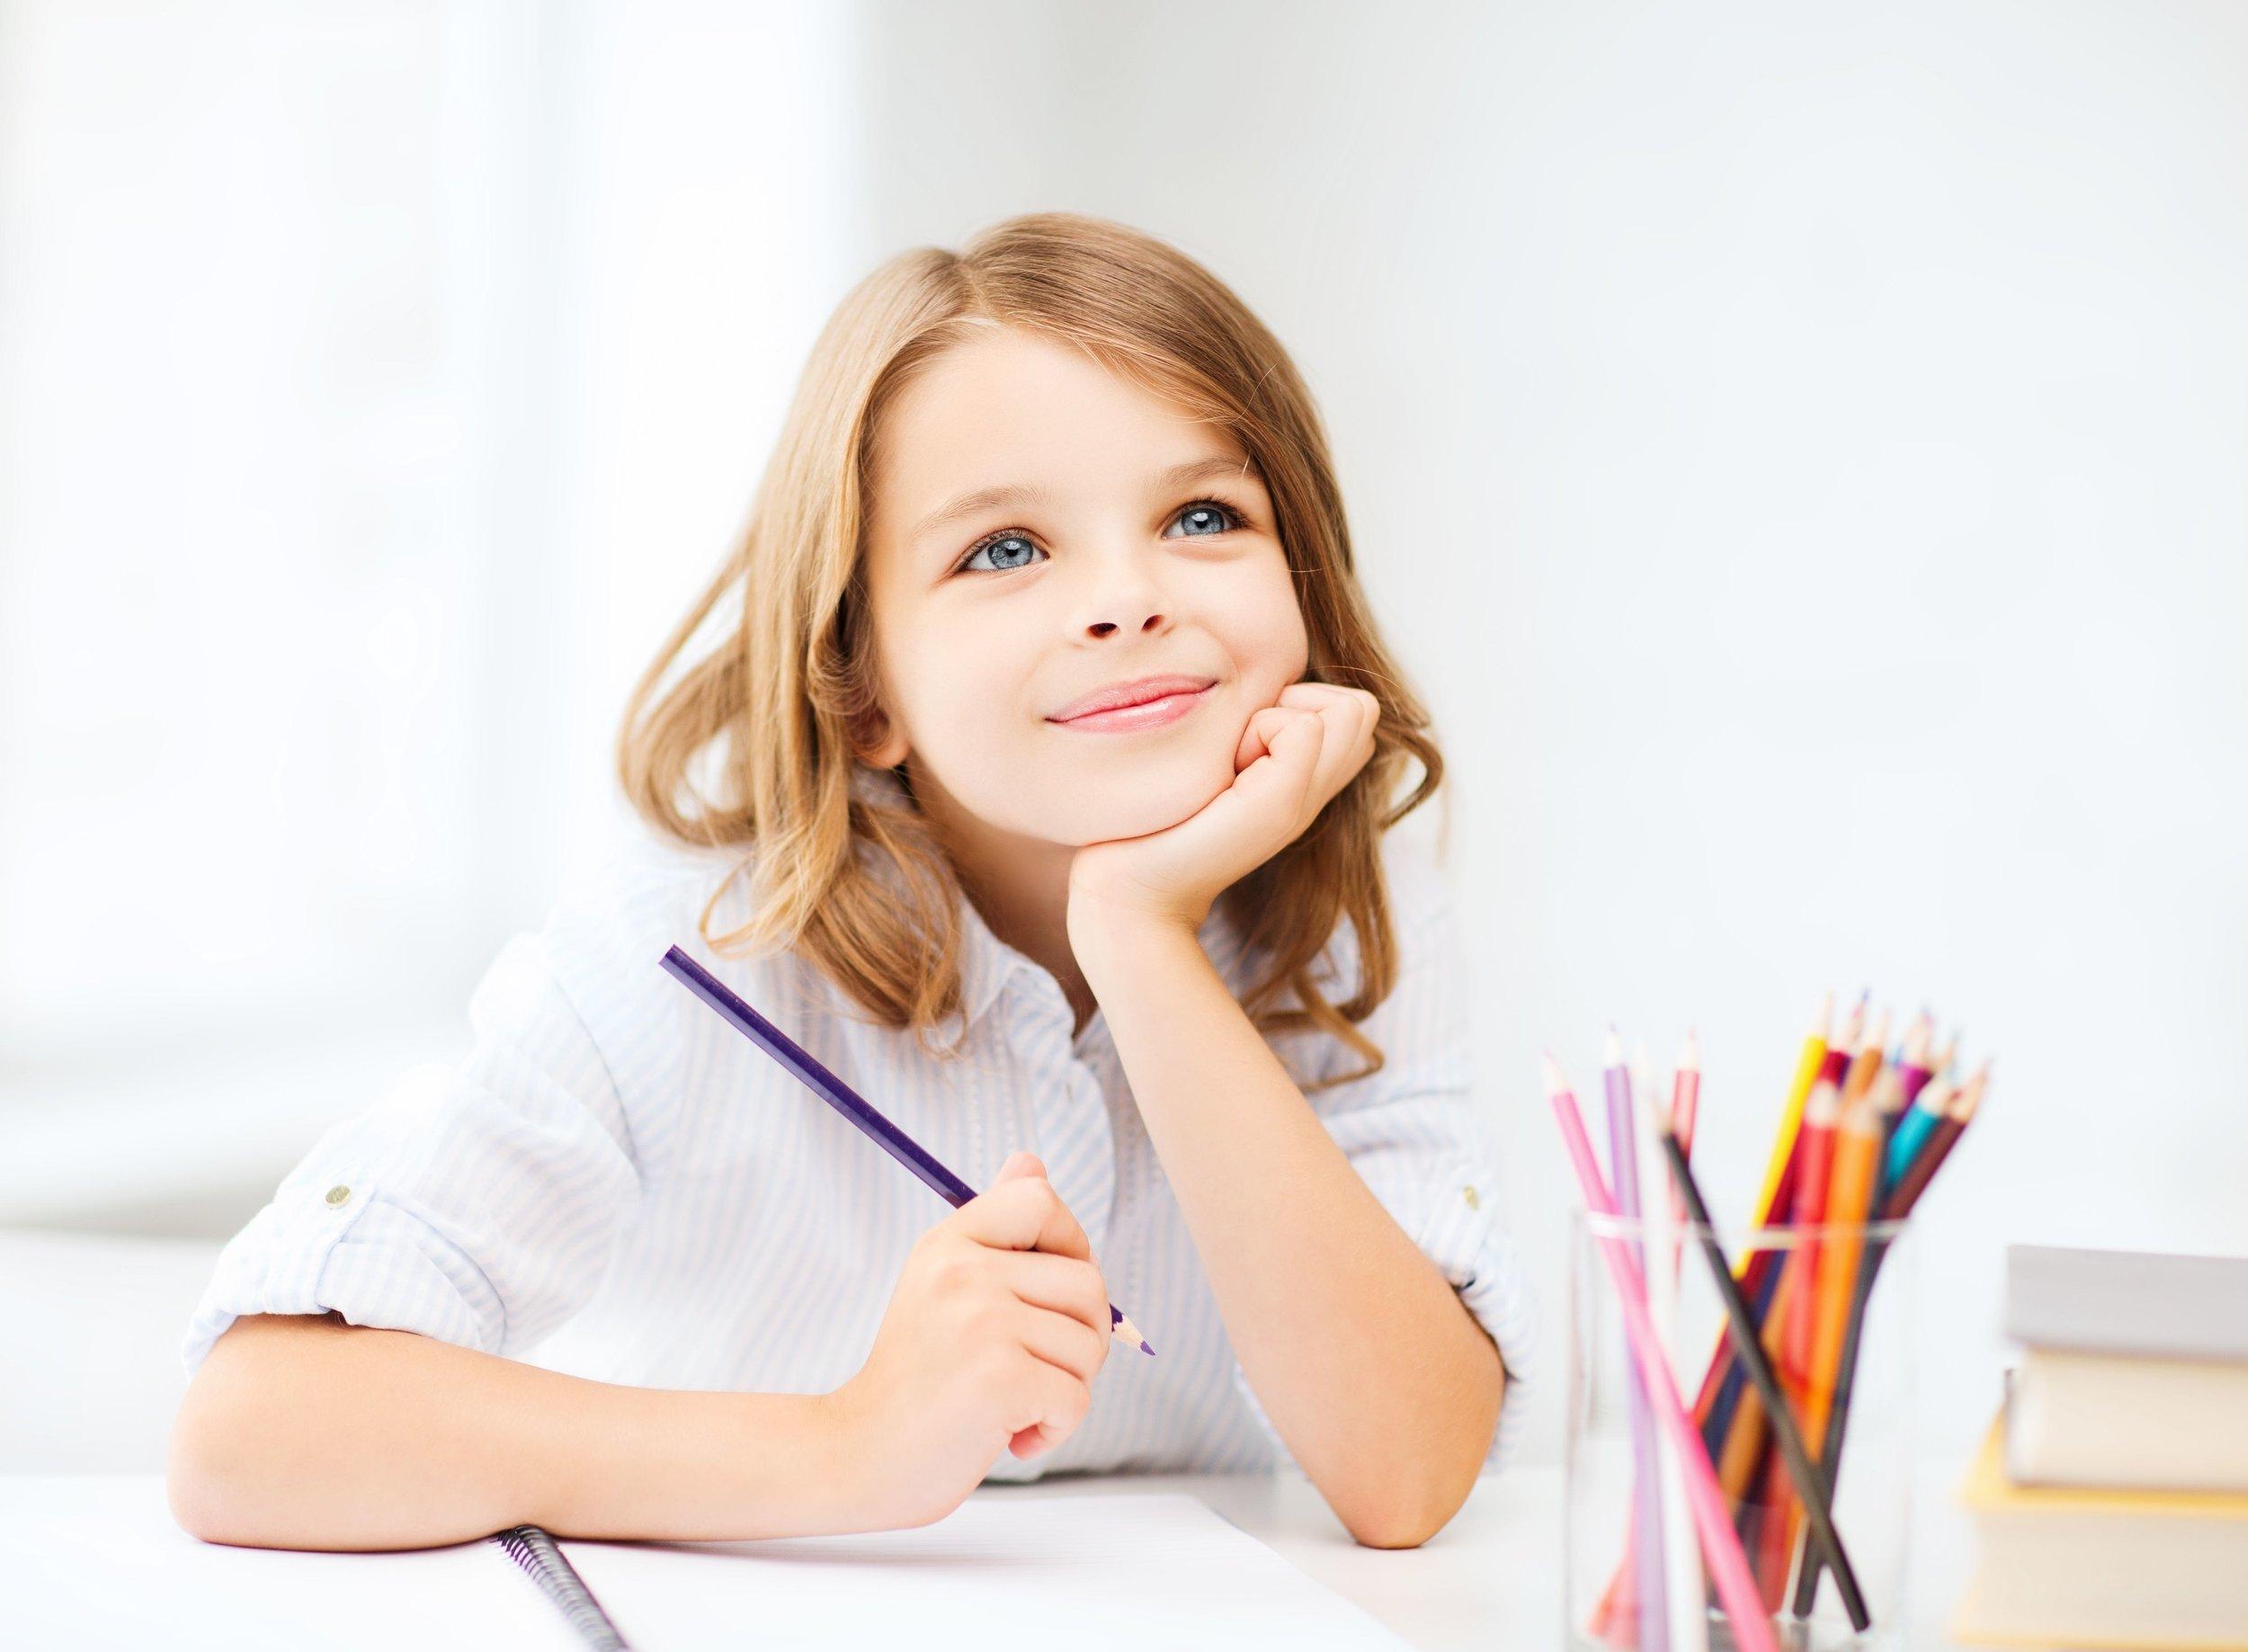 bigstock-education-and-school-concept--49824896.jpg